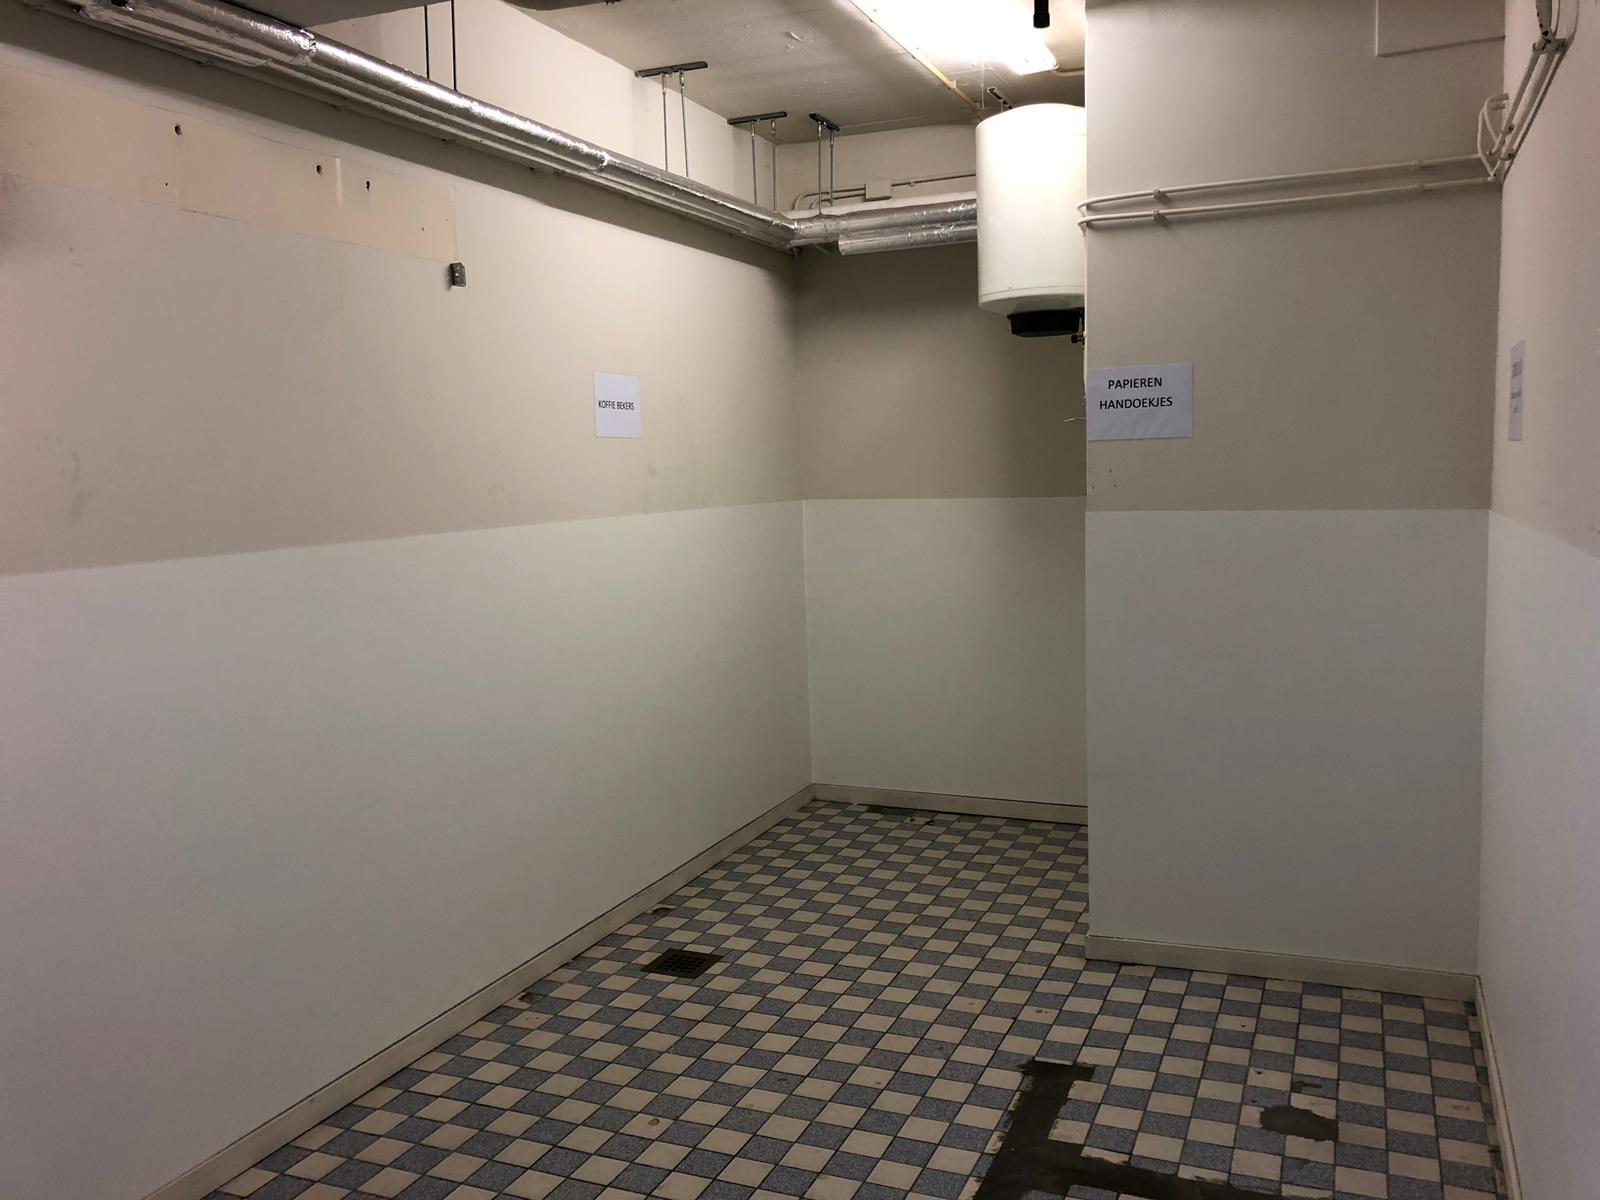 Wandbescherming installatie